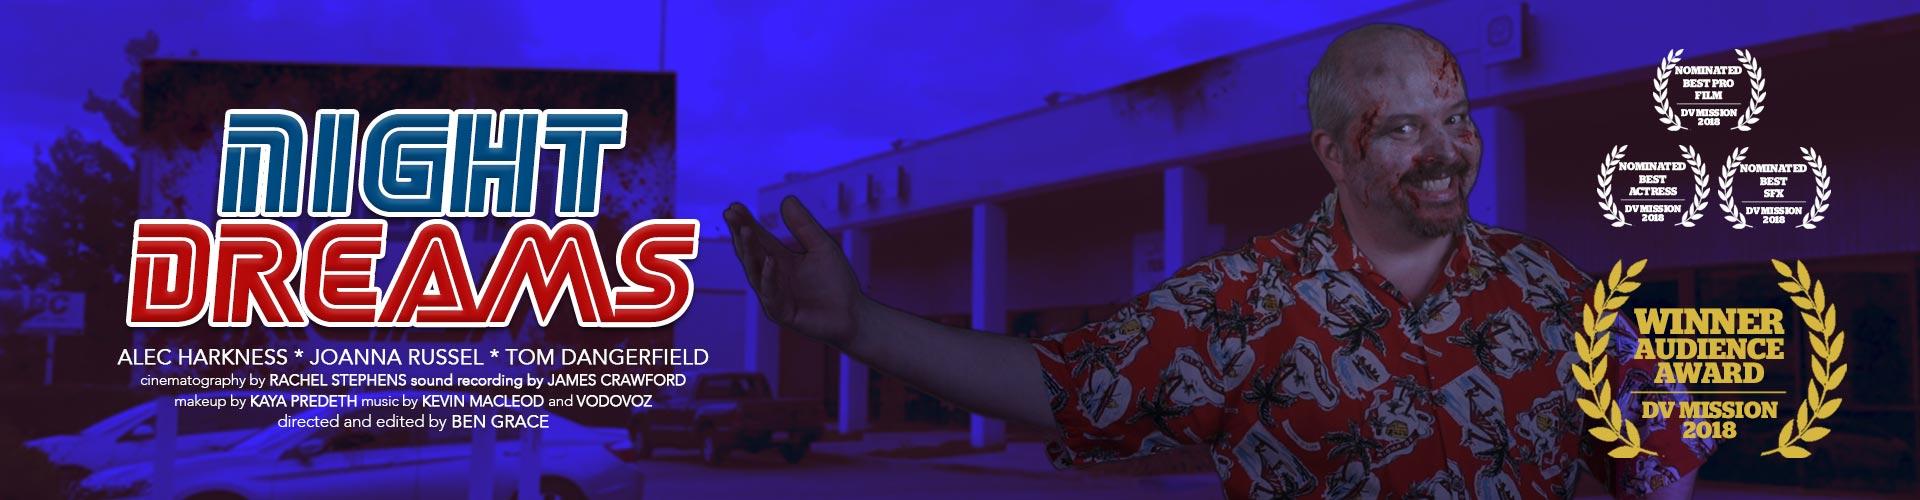 Night Dreams | Ben Grace Films | BenGrace.co.uk